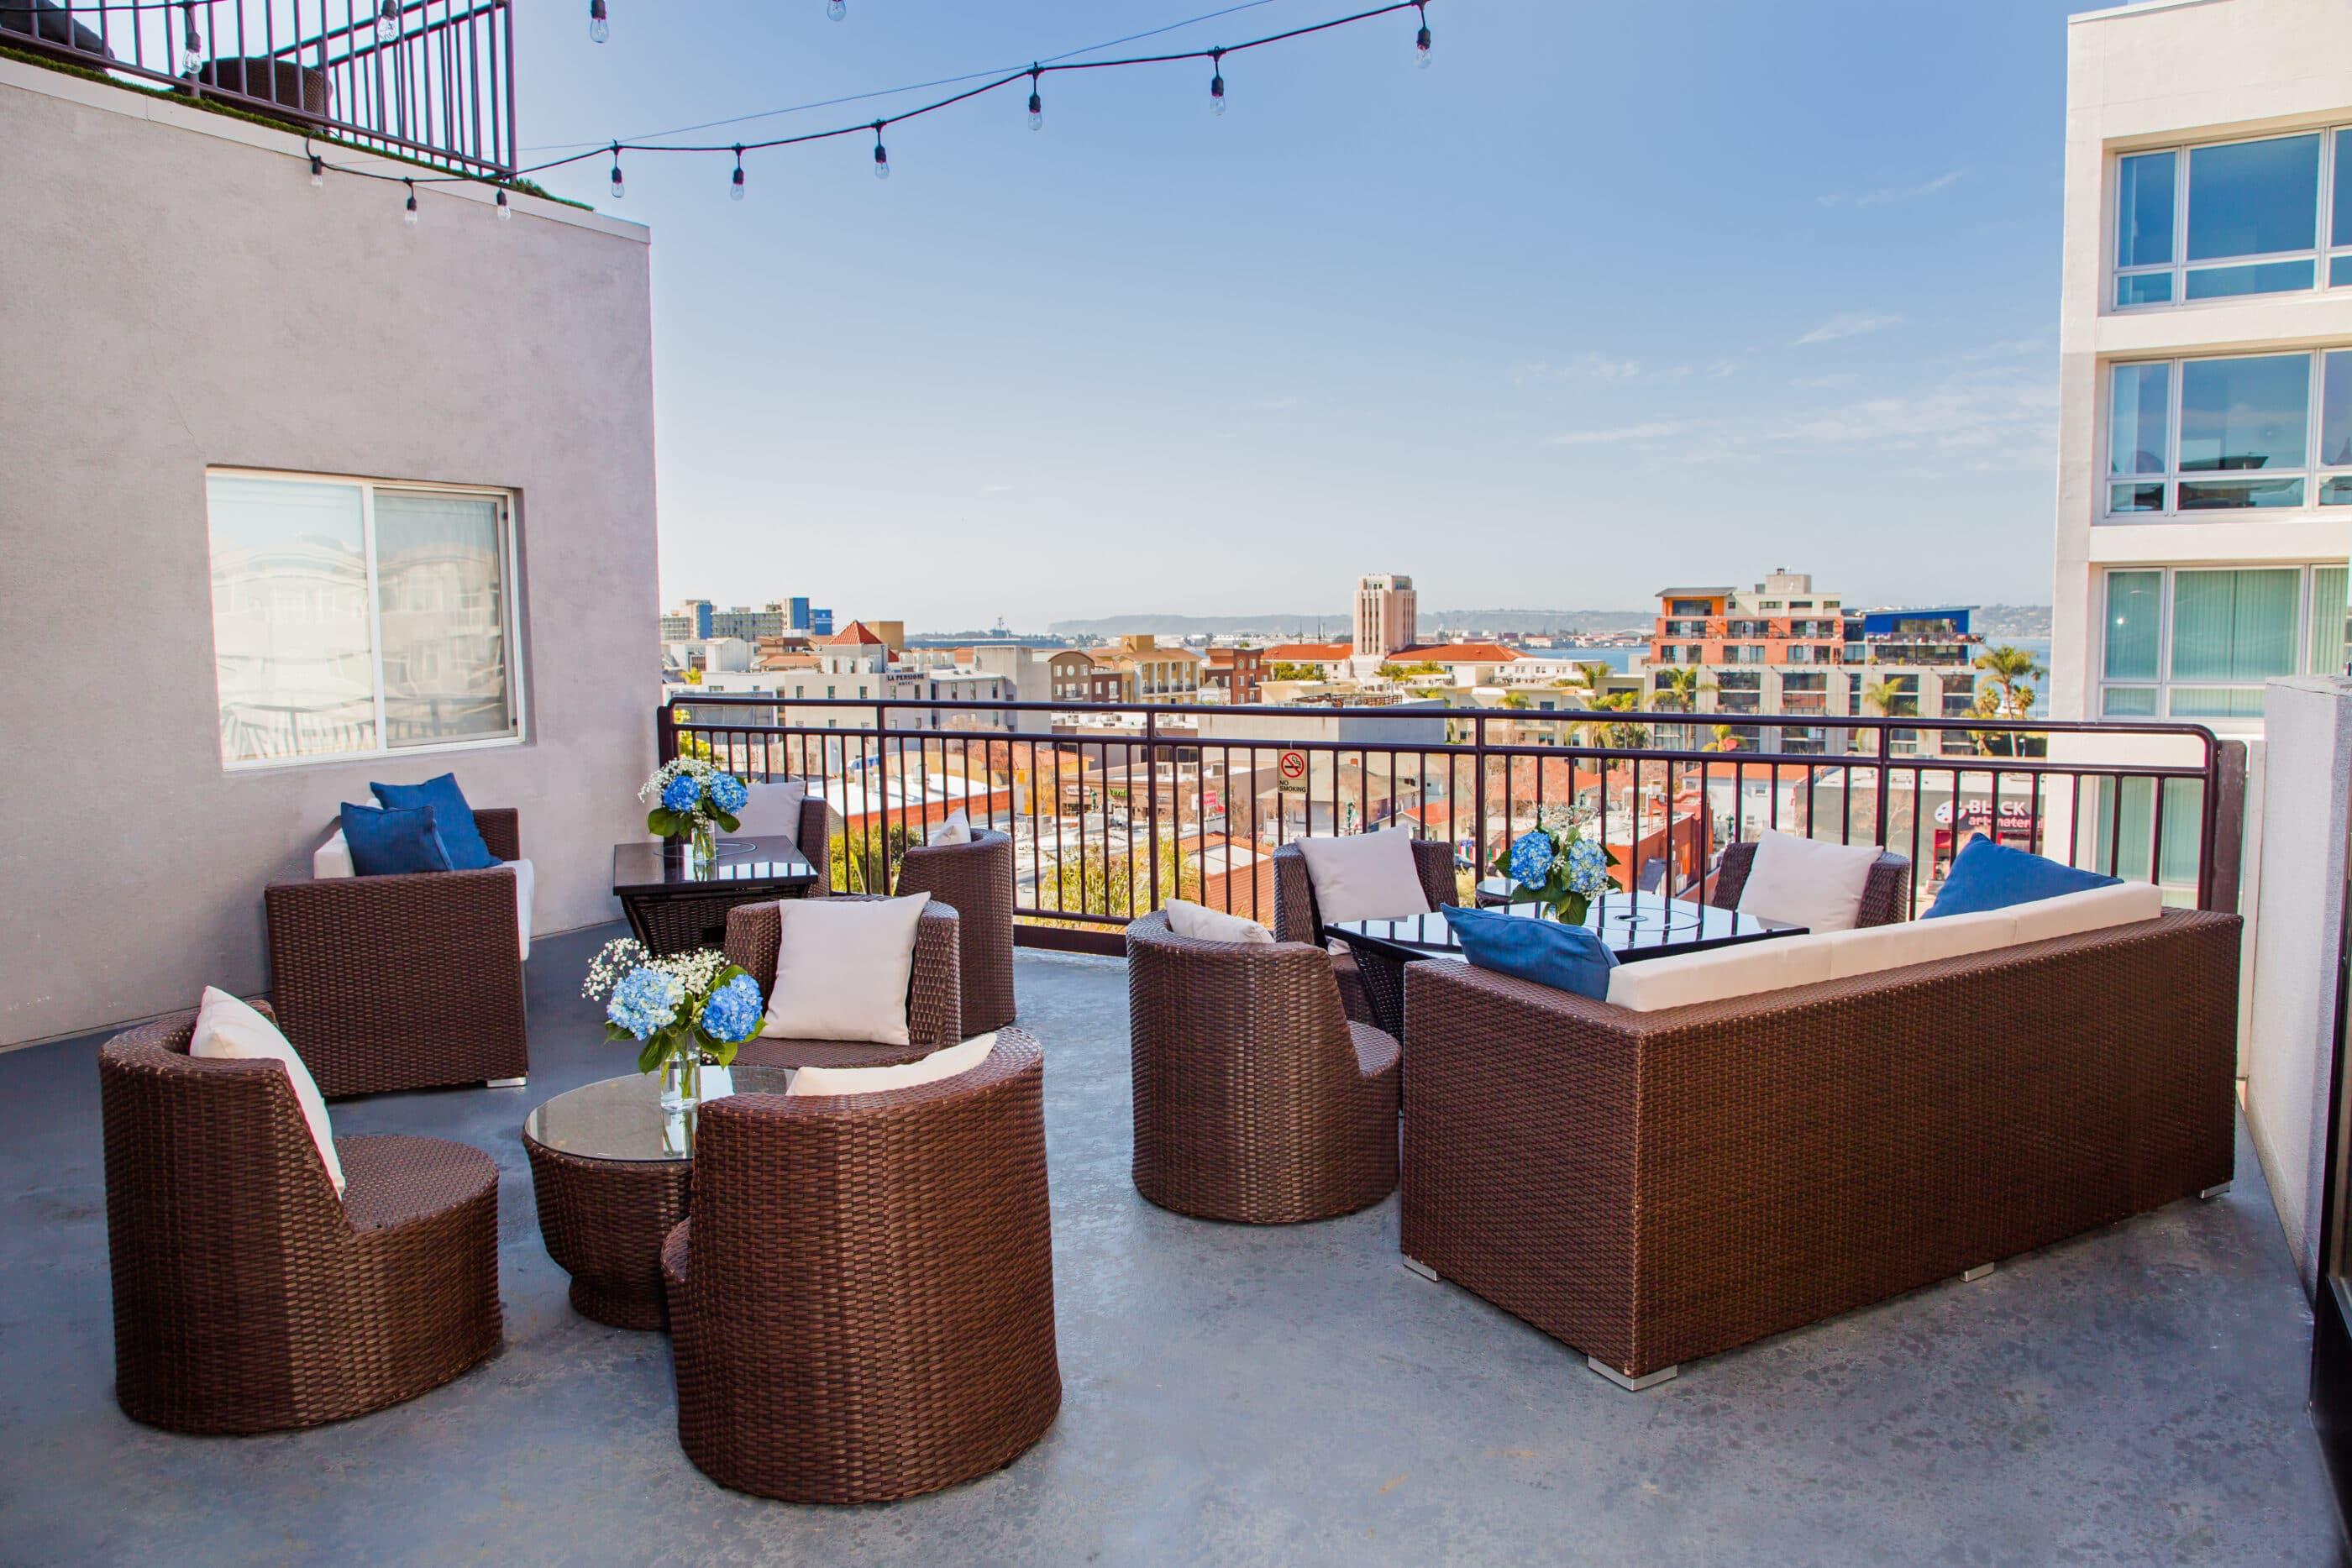 Outdoor terrace at Porto Vista Hotel overlooking Little Italy.